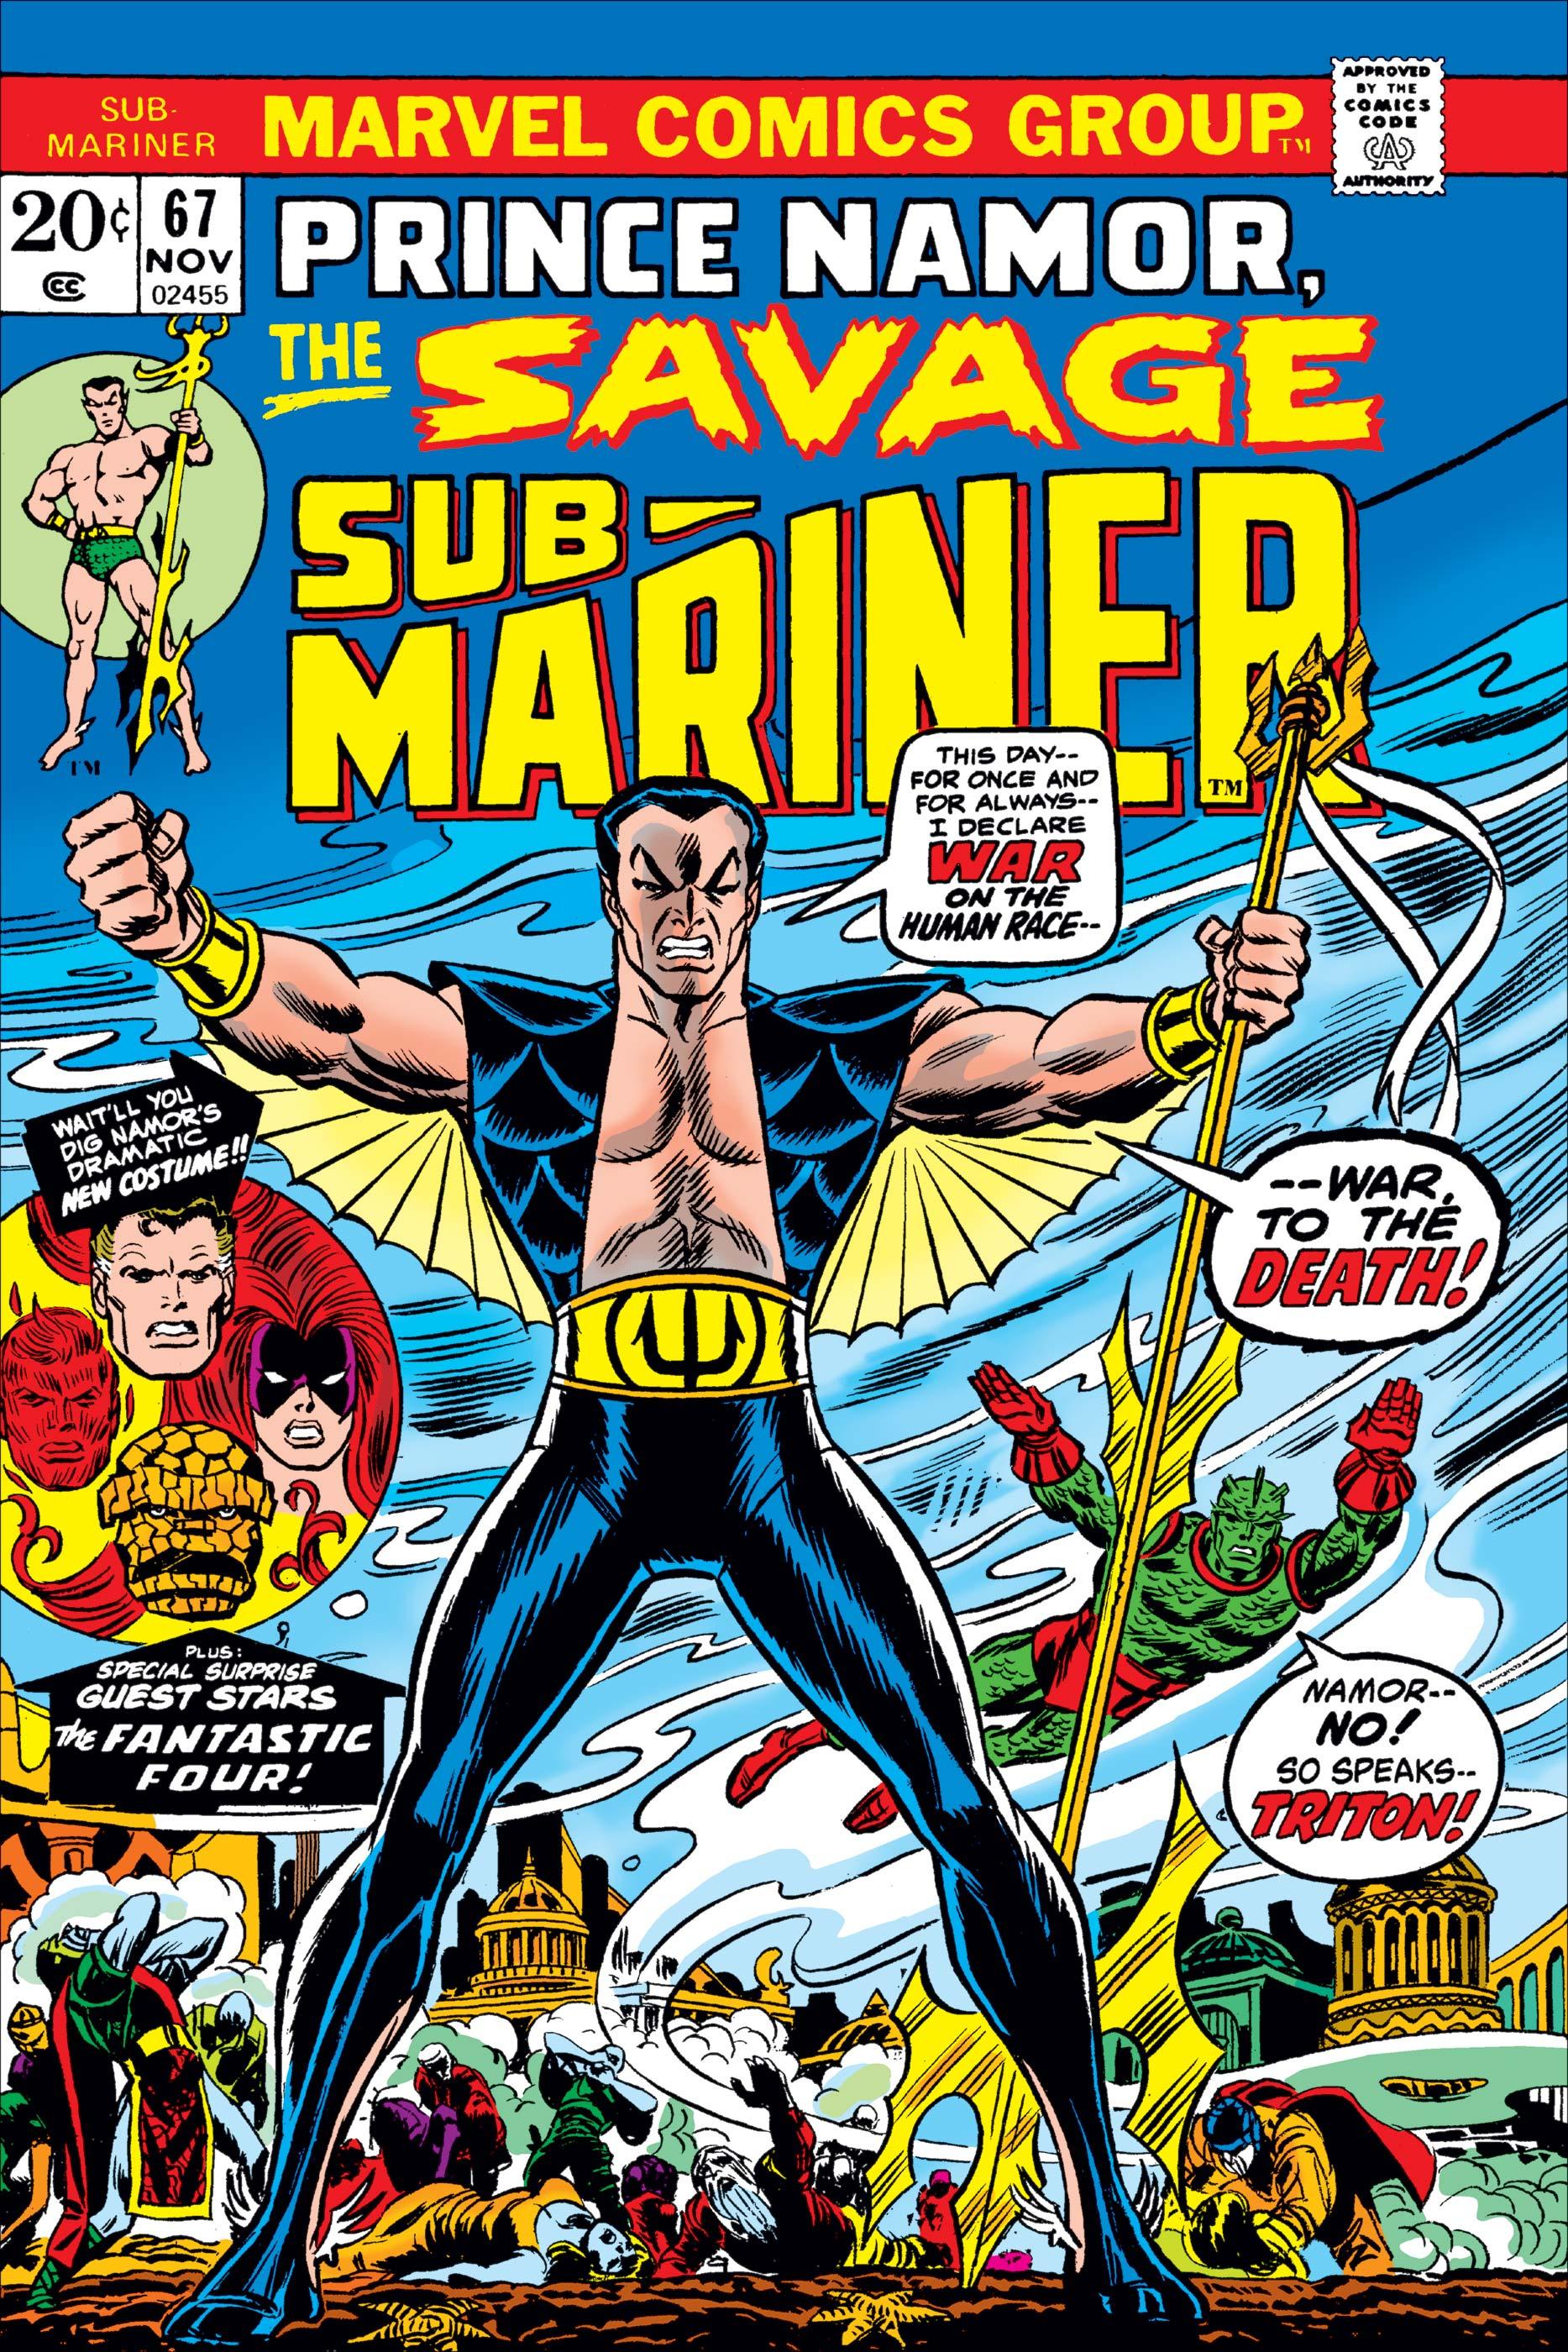 Sub-Mariner (1968) #67